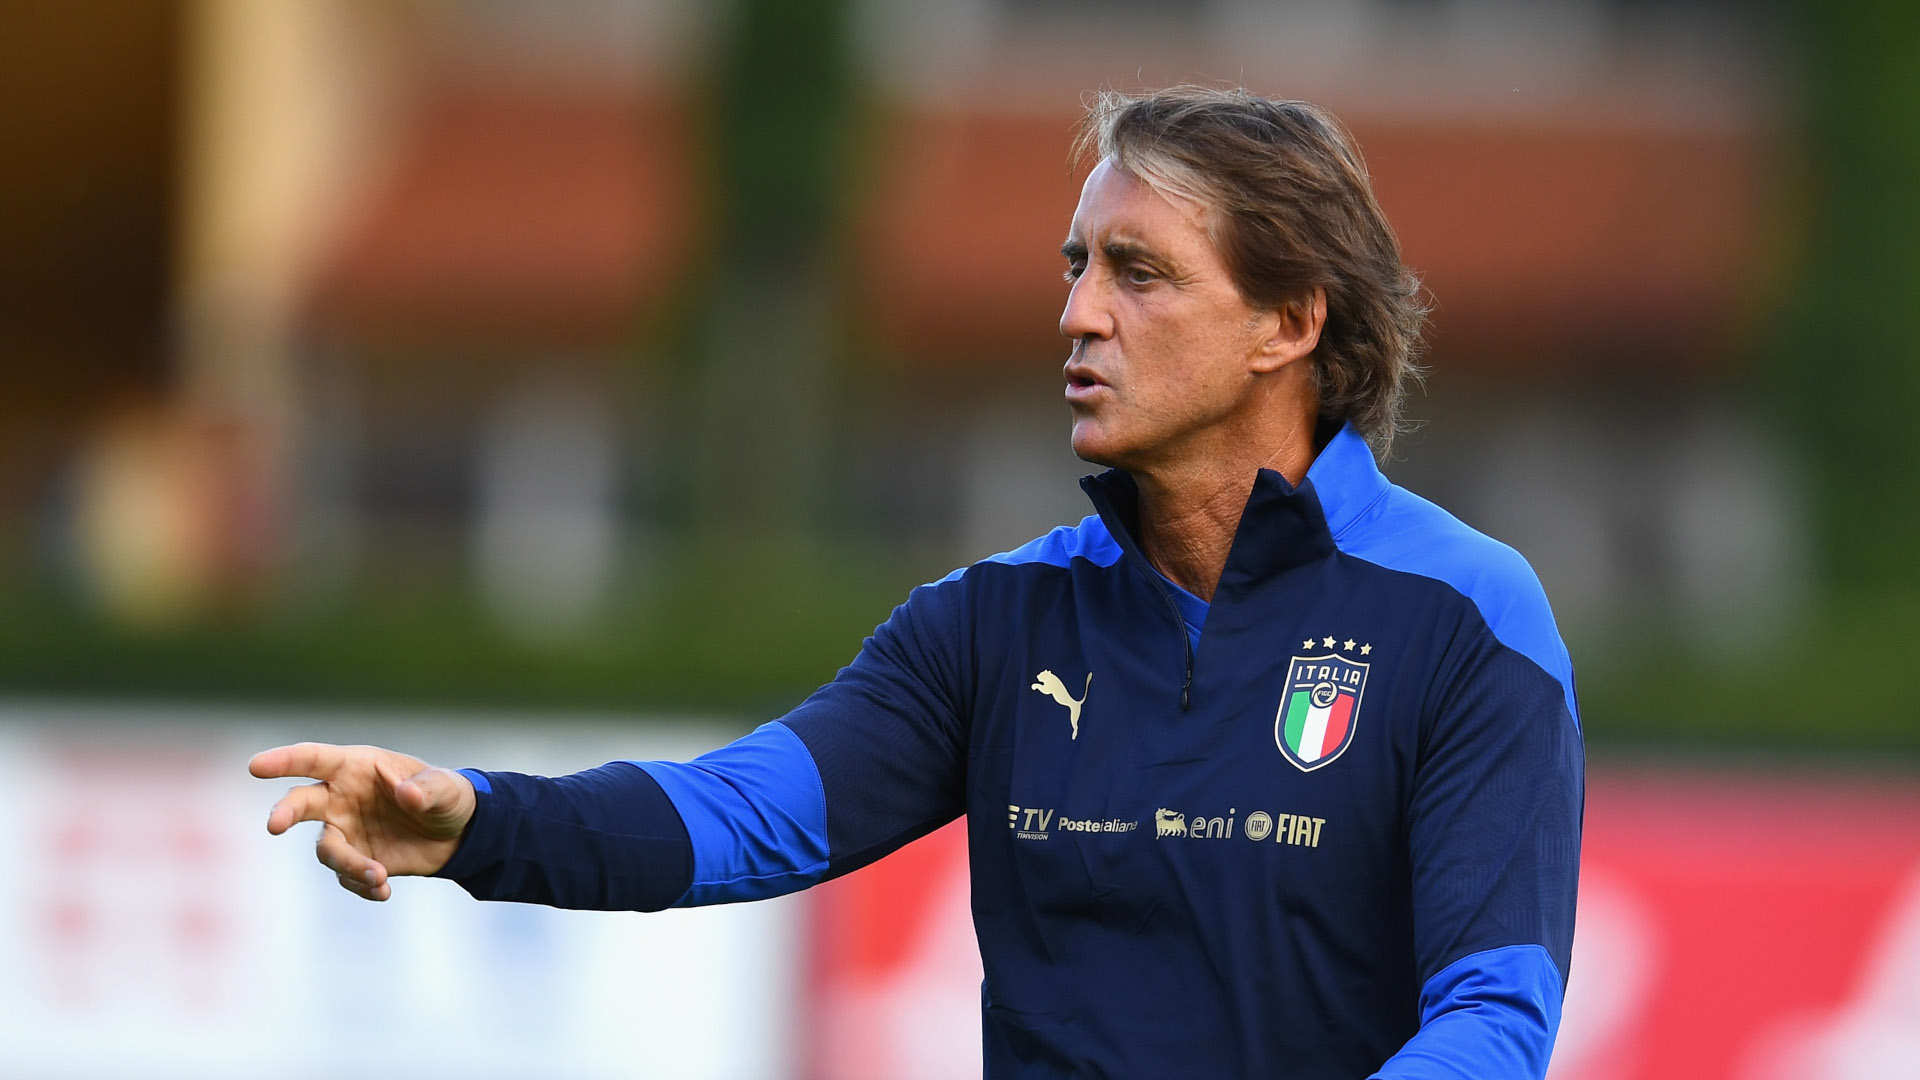 A Itália ainda pode crescer após o título da Euro?